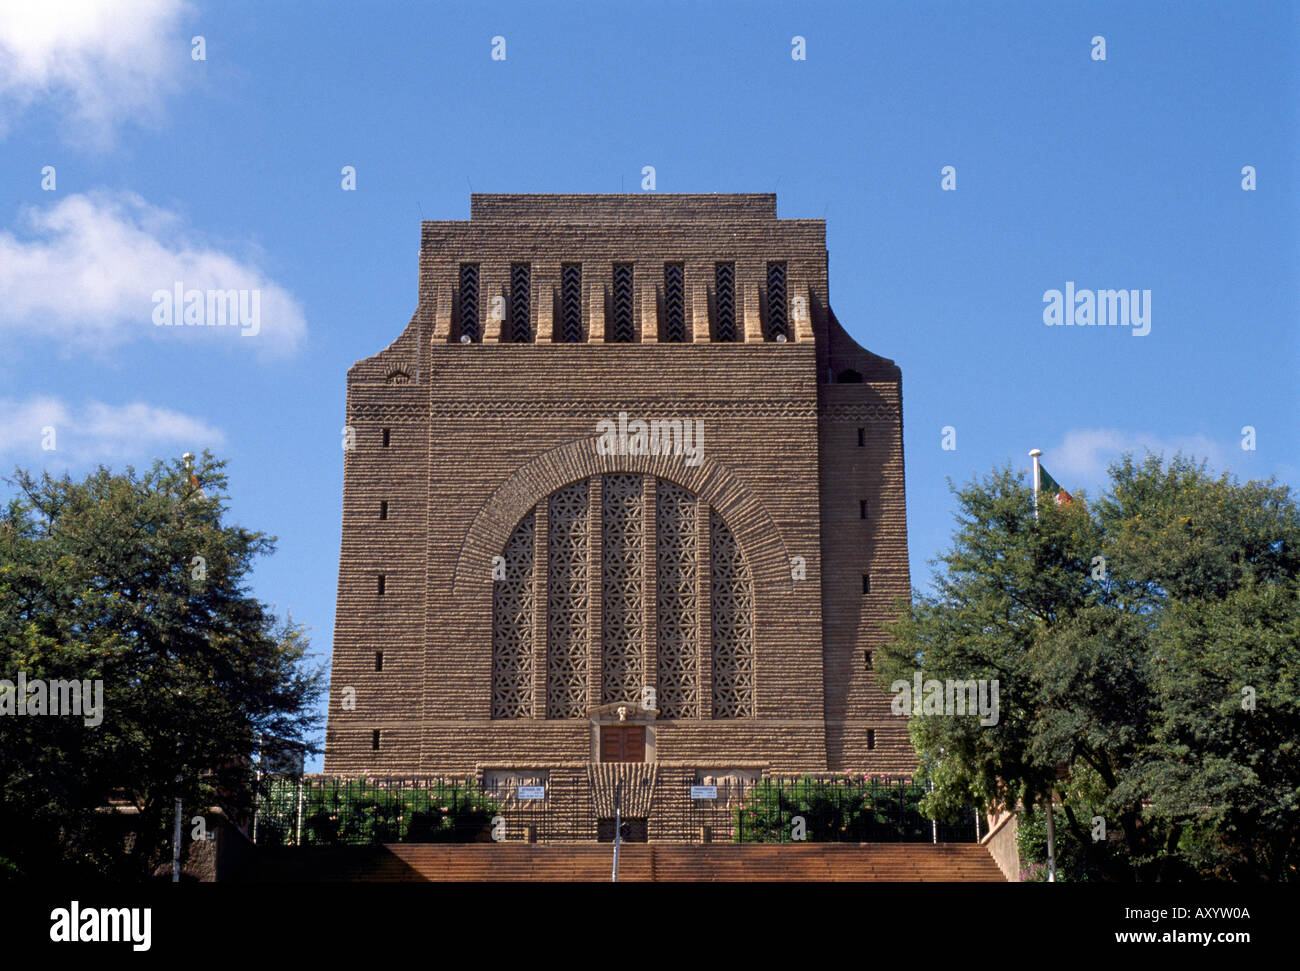 Pretoria, Vortrekkermonument, Totale - Stock Image